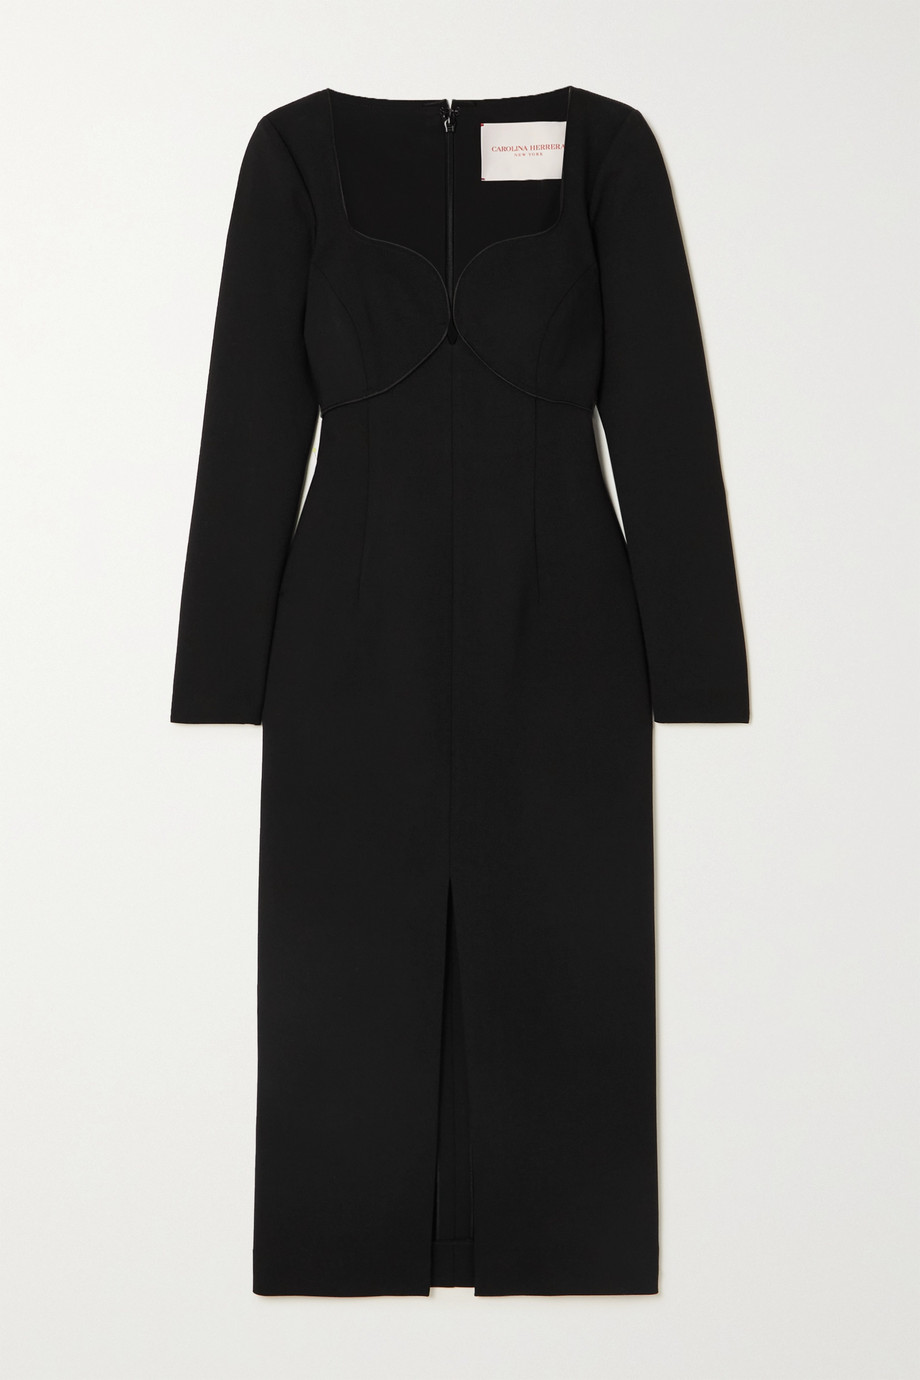 Carolina Herrera Paneled wool-blend cady midi dress